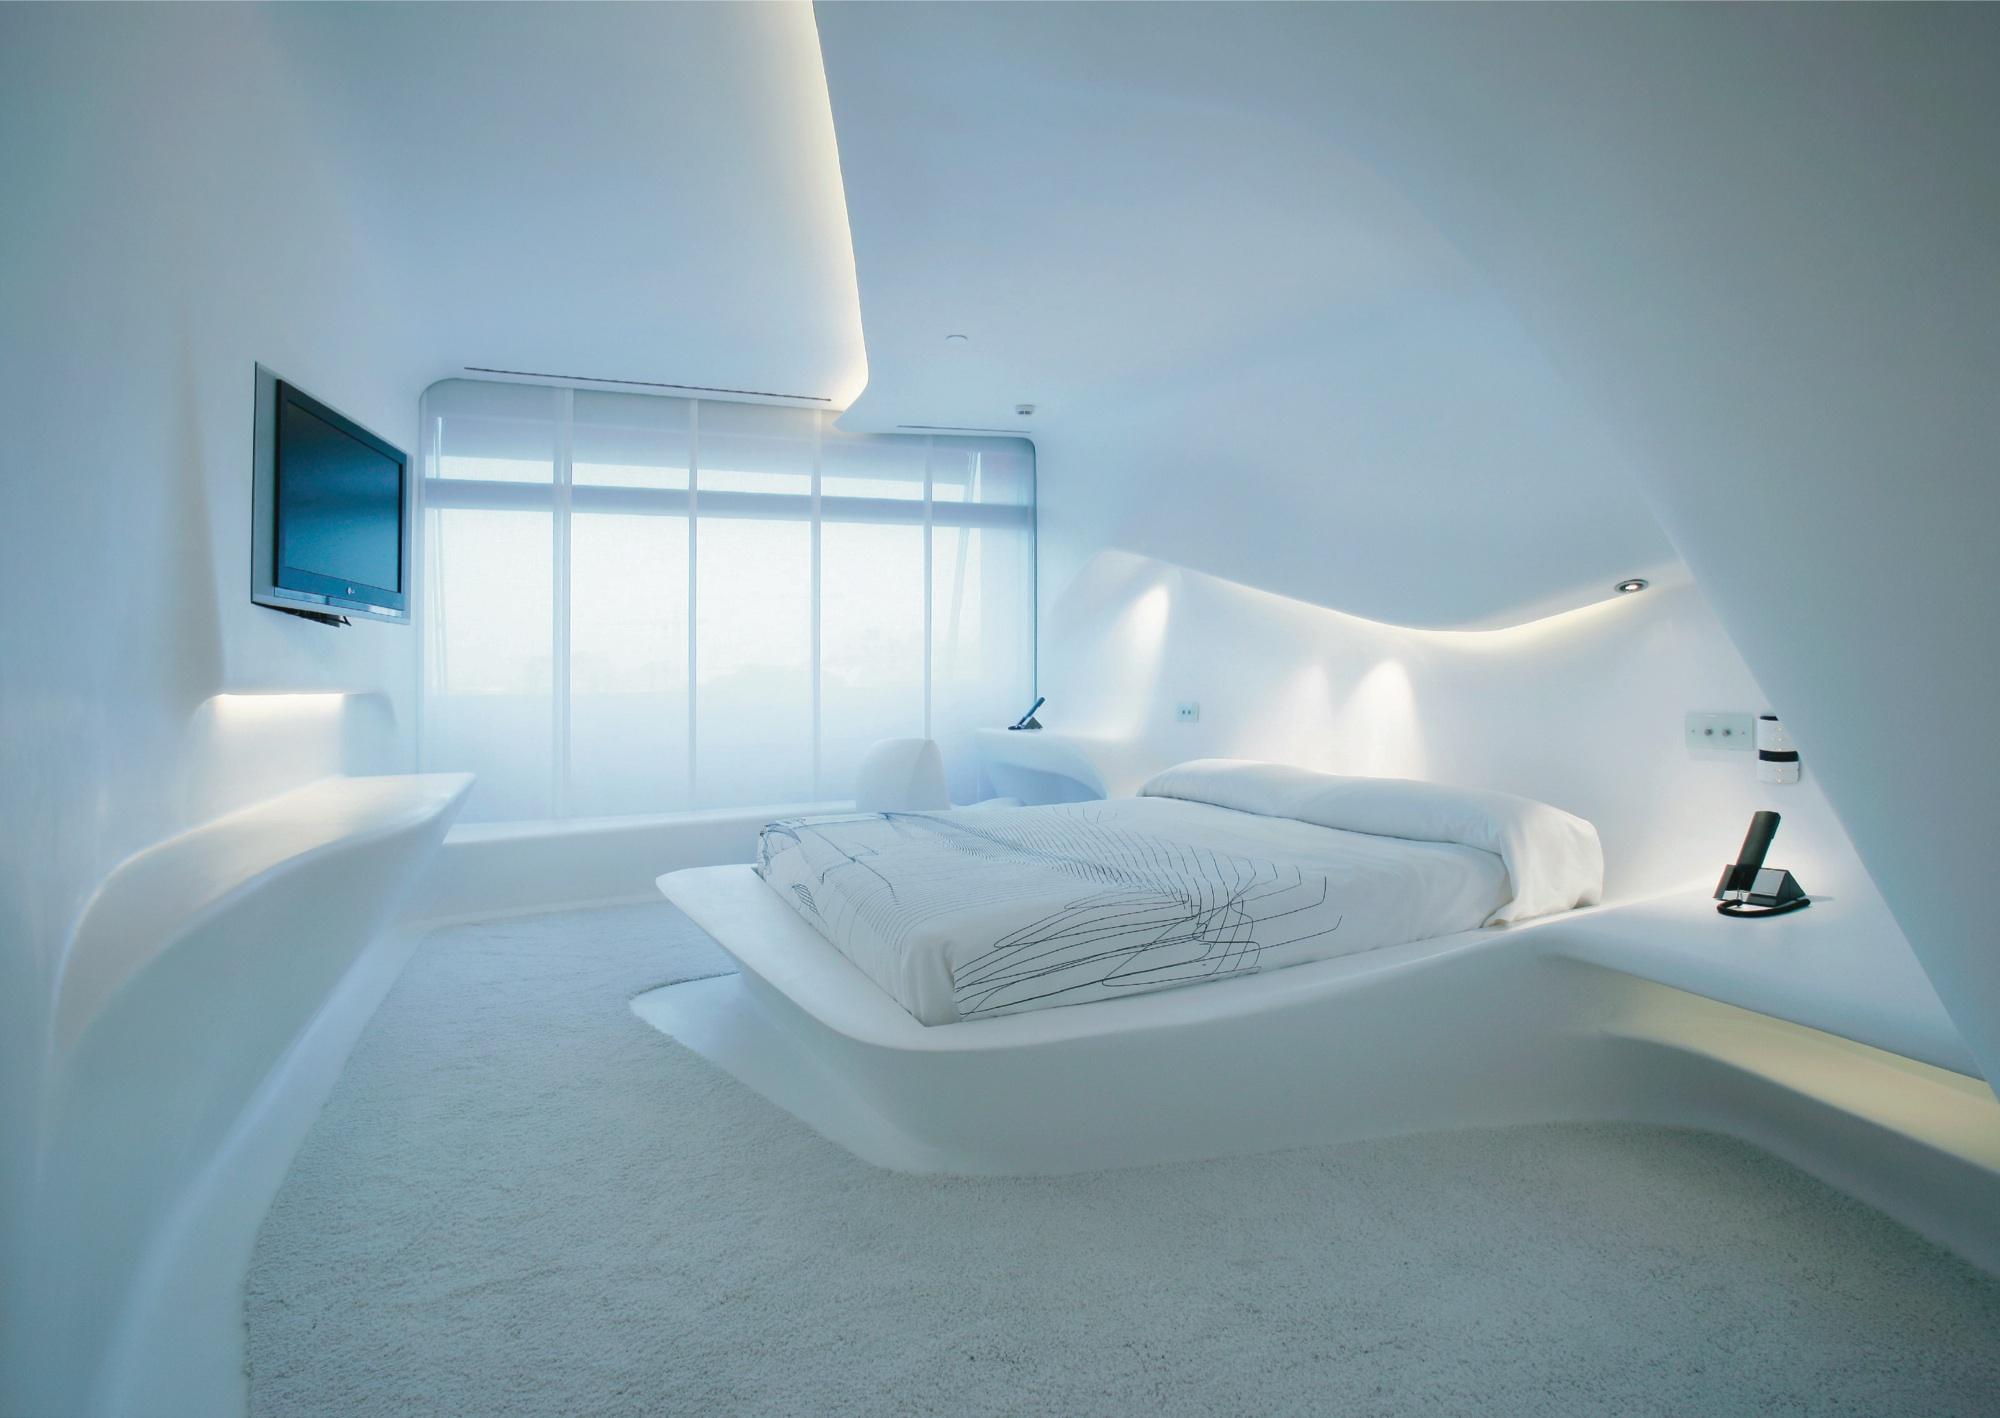 Puerta America Hotel (Zaha Hadid suite) in Madrid, Spain